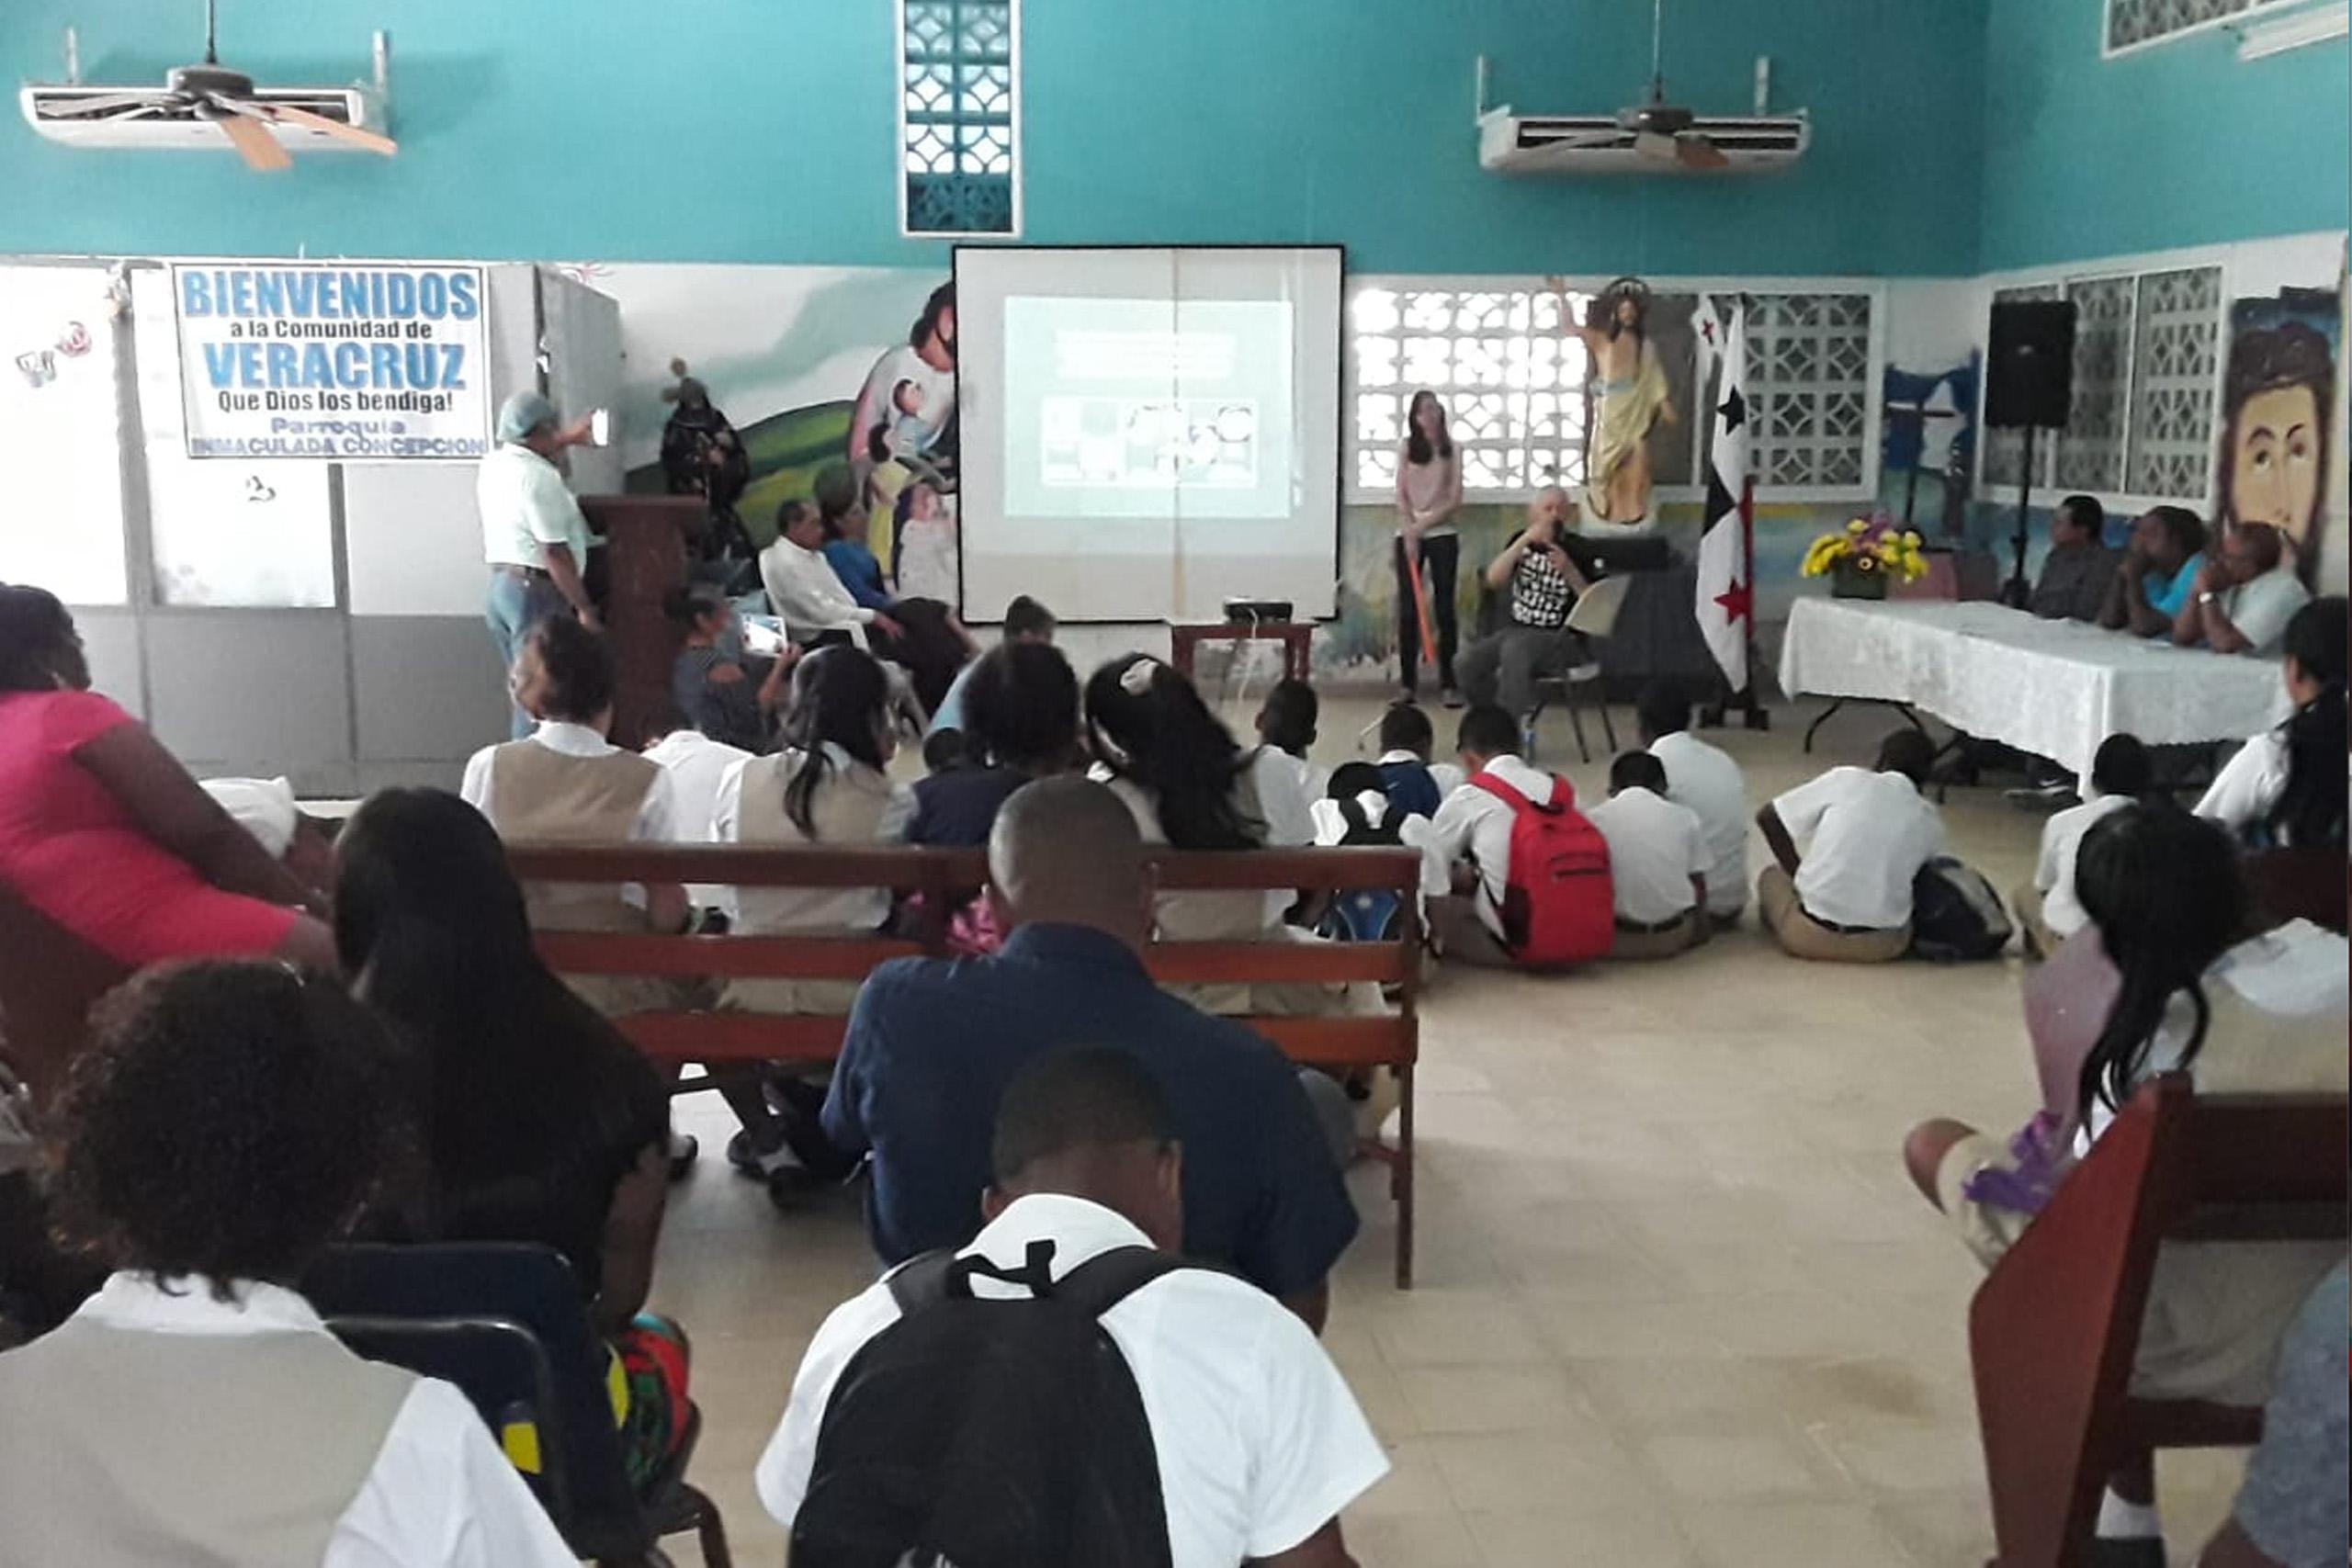 The presentation was regarding the important pre-Columbian cemetery located in Playa Venado, Veracruz, Panama